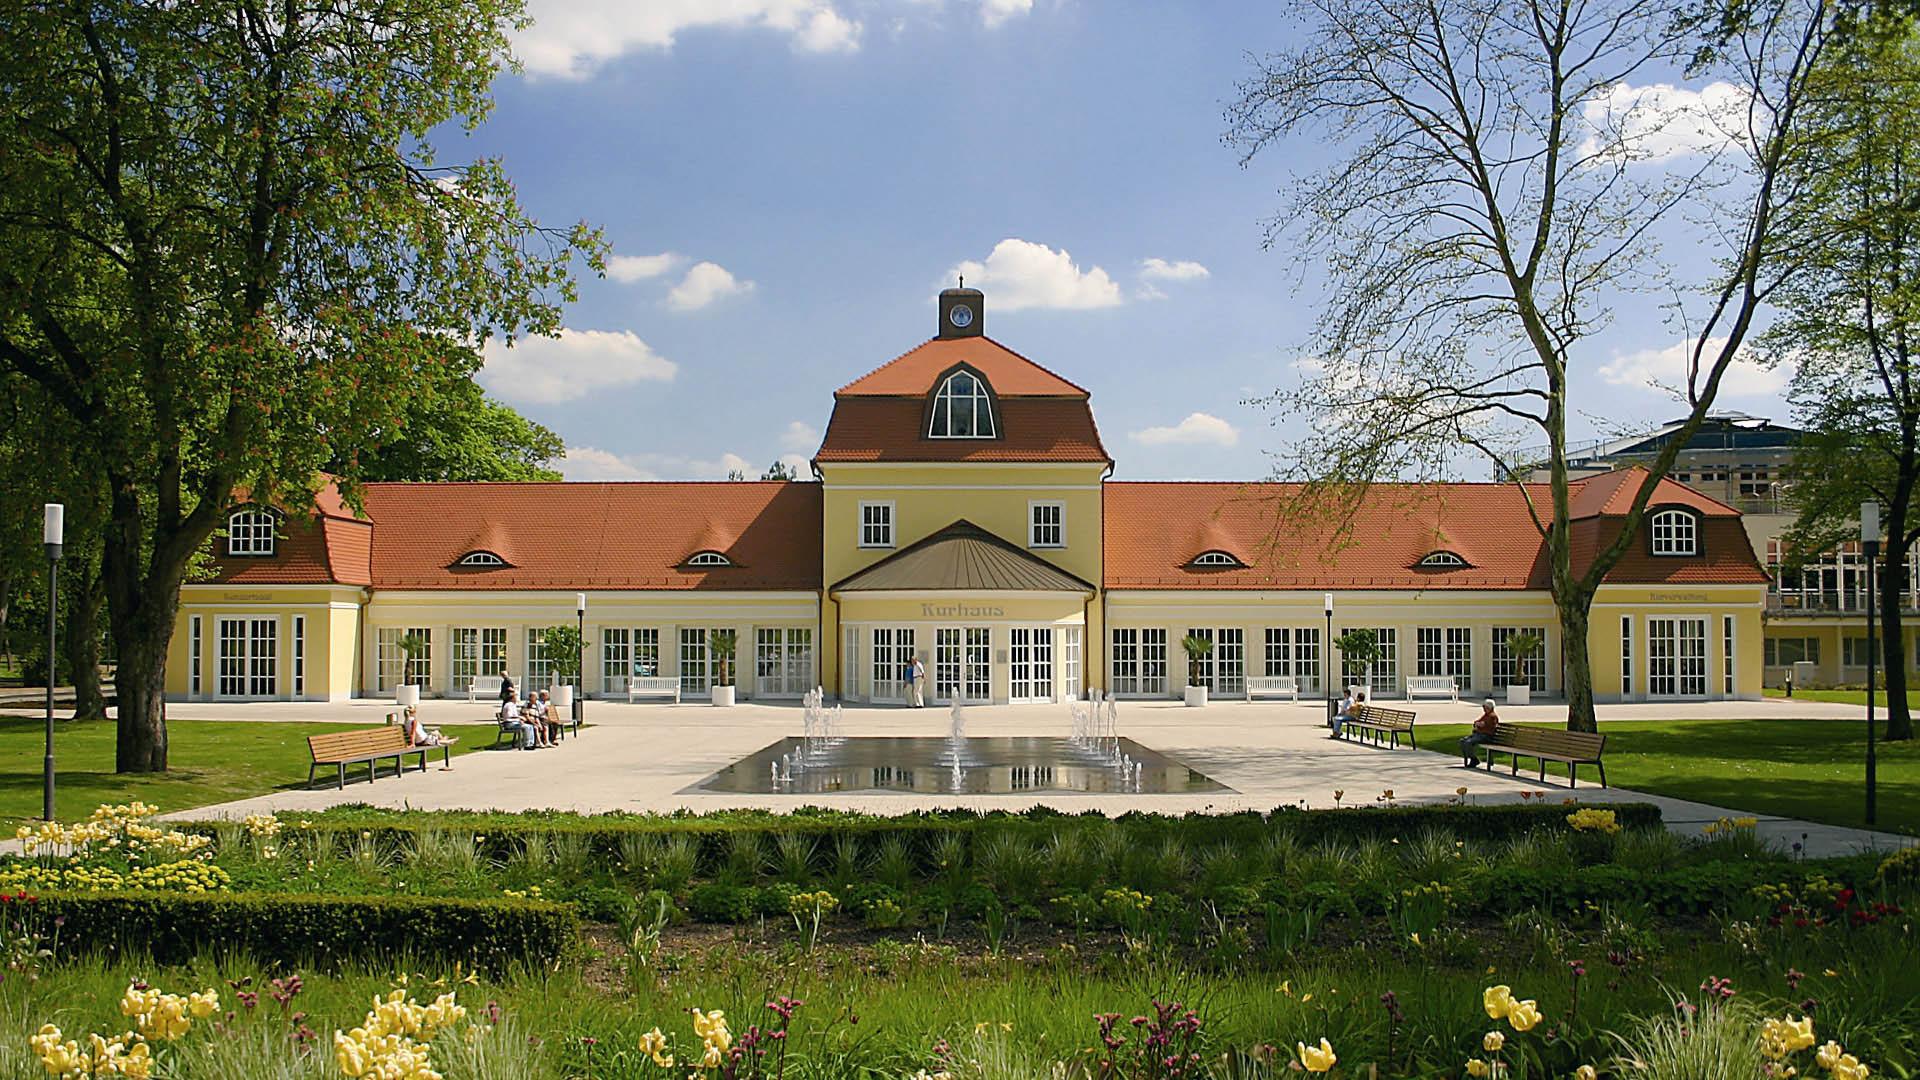 Ausflugsziele Bad Hersfeld ca. 20 km entfernt